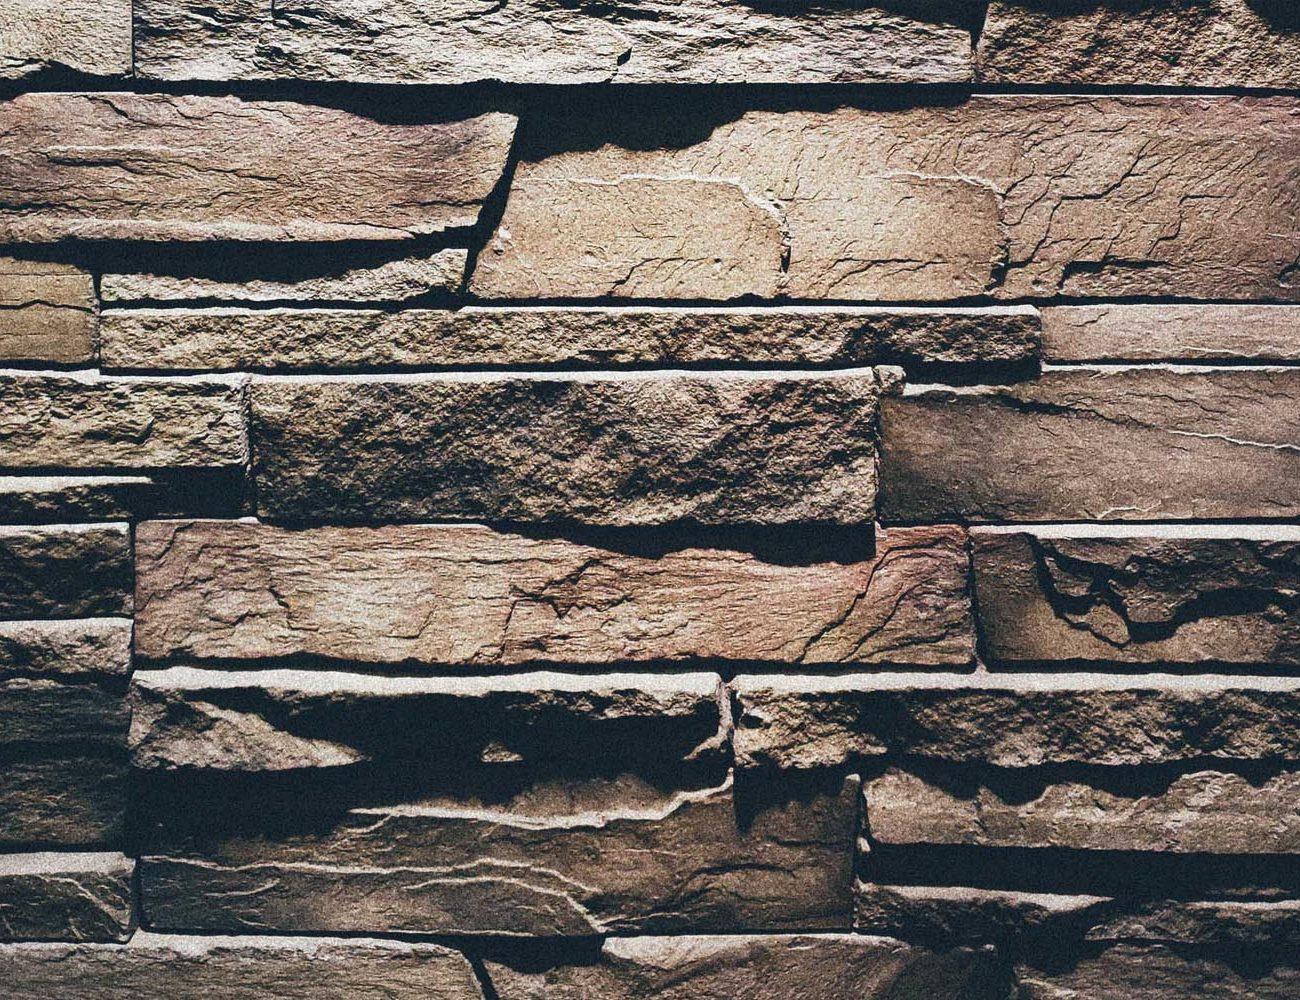 cbc-stone-wall-4